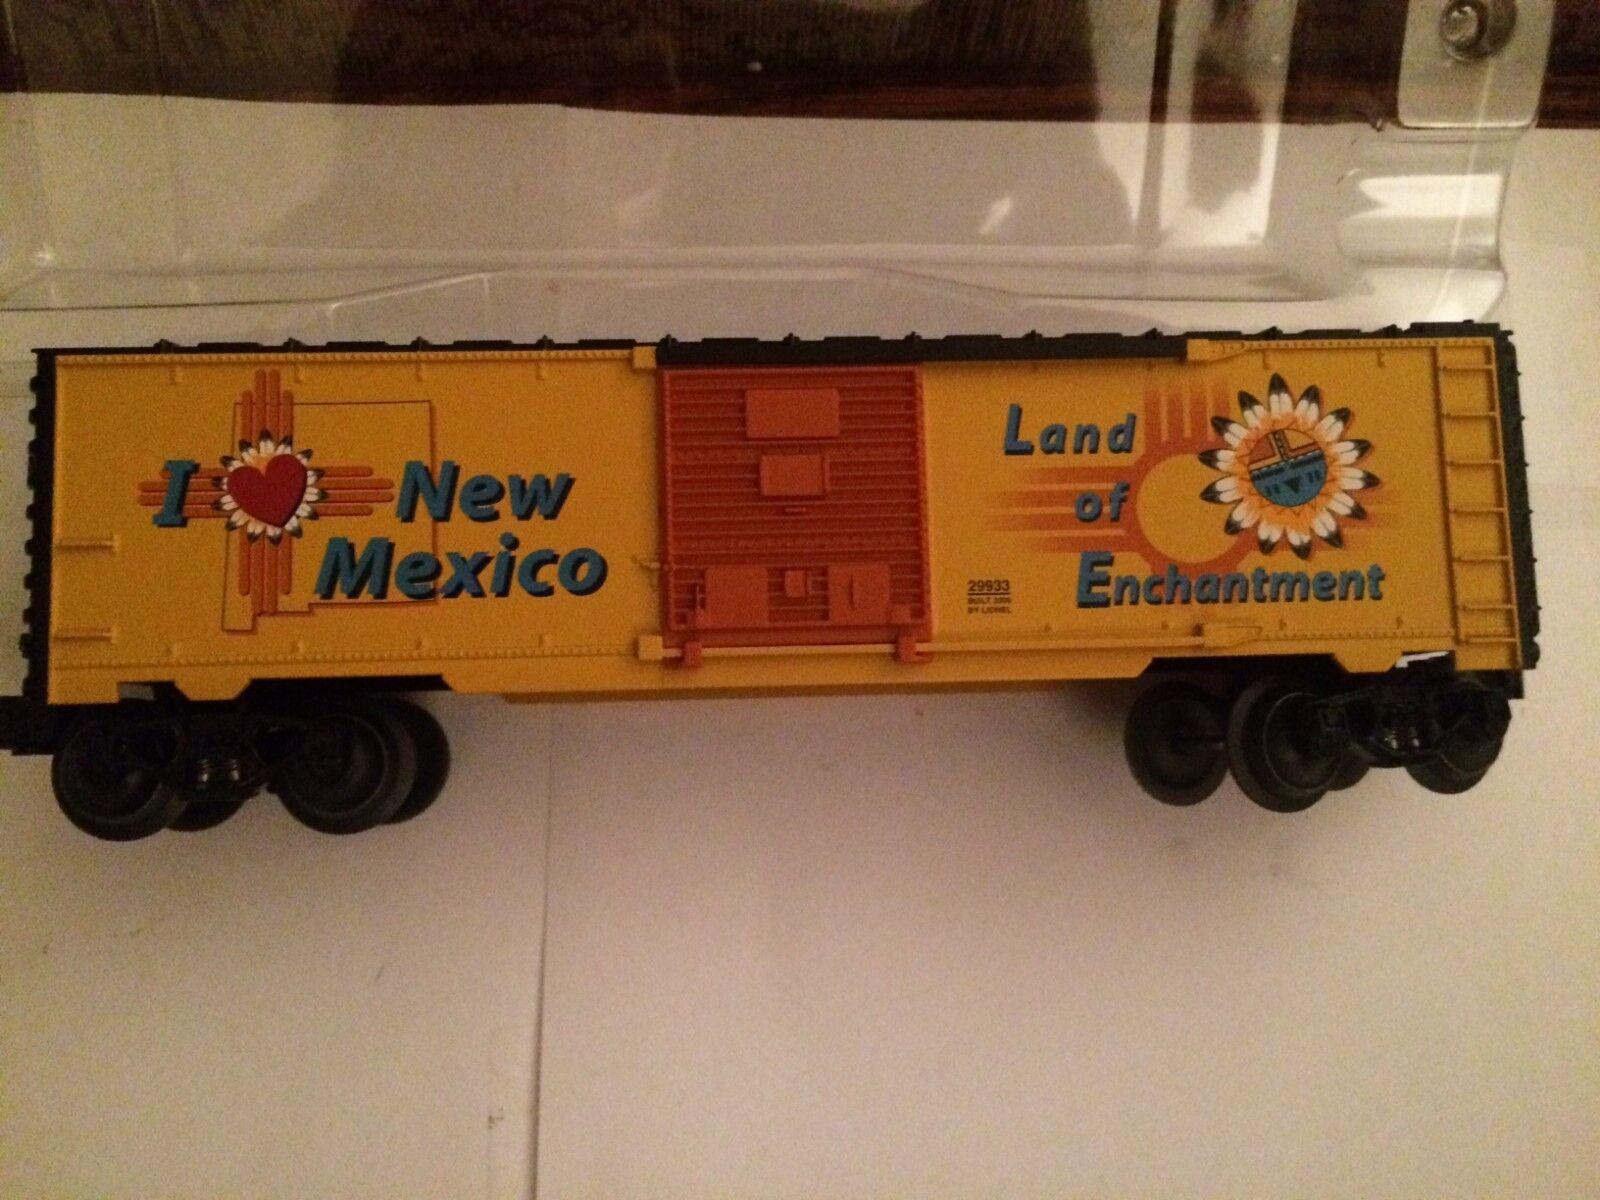 Lionel 29933 Jag älskar New Mexico låda Bil New in låda